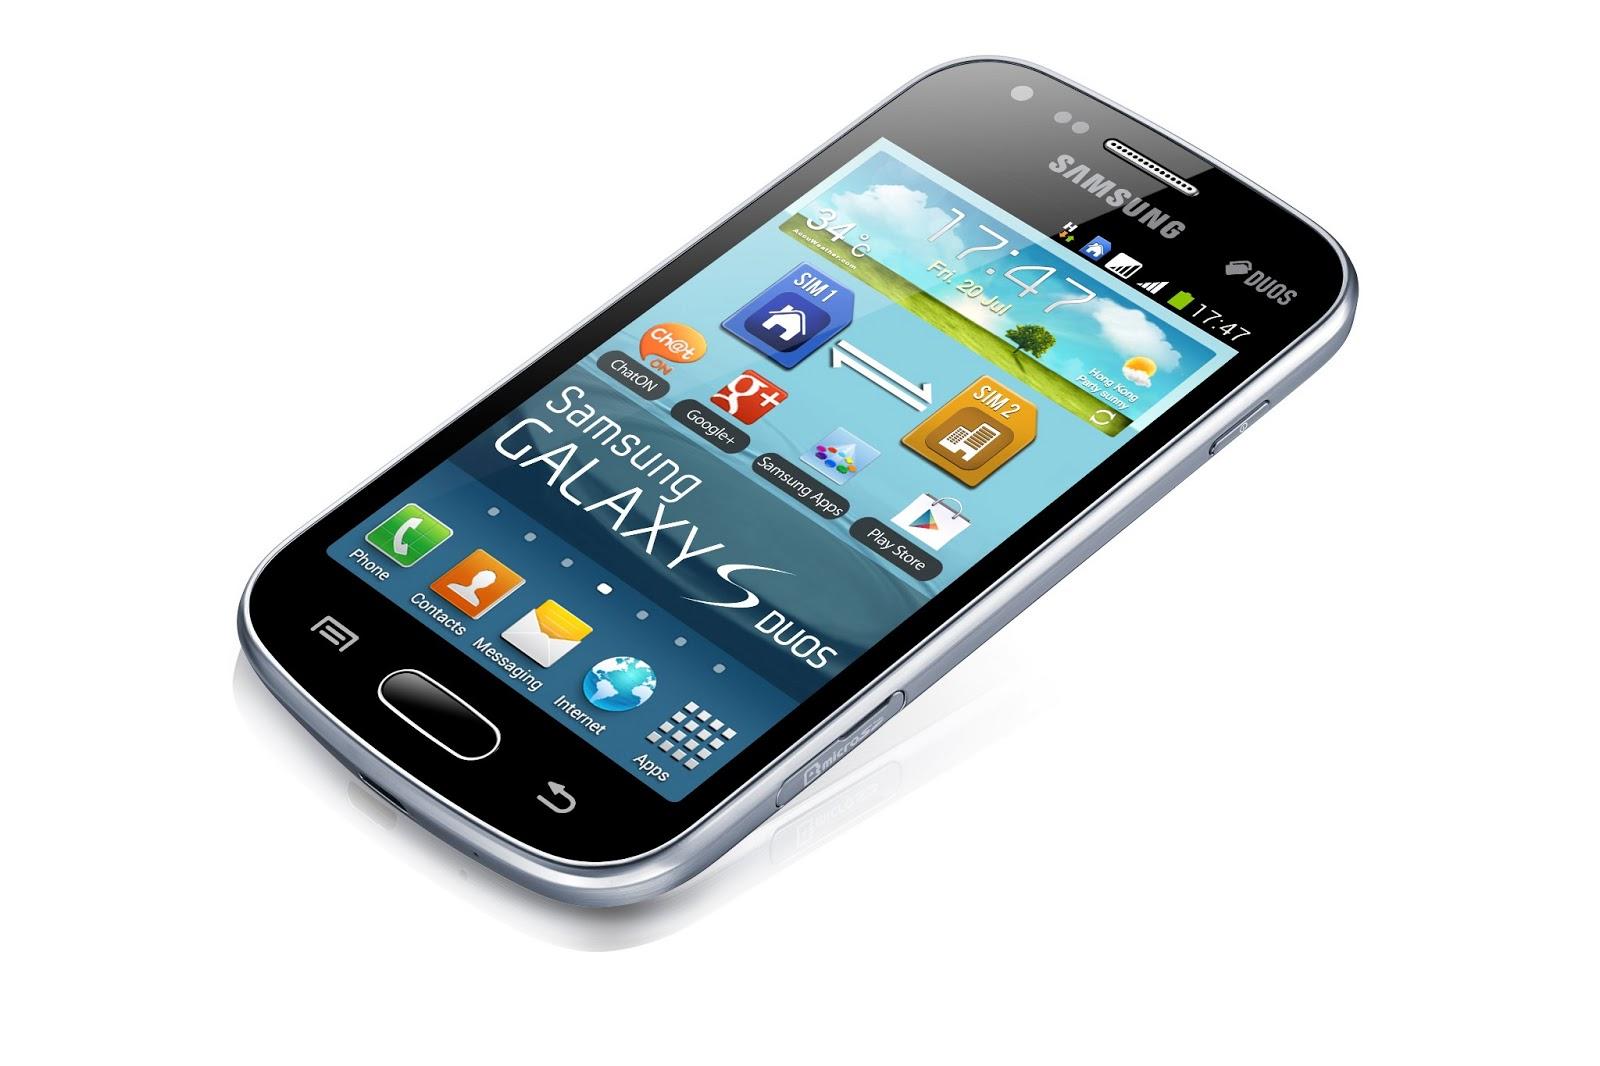 Samsung galaxy s duos s7562 full phone specifications - Samsung Galaxy S Duos Gt 7562 Full Specifications